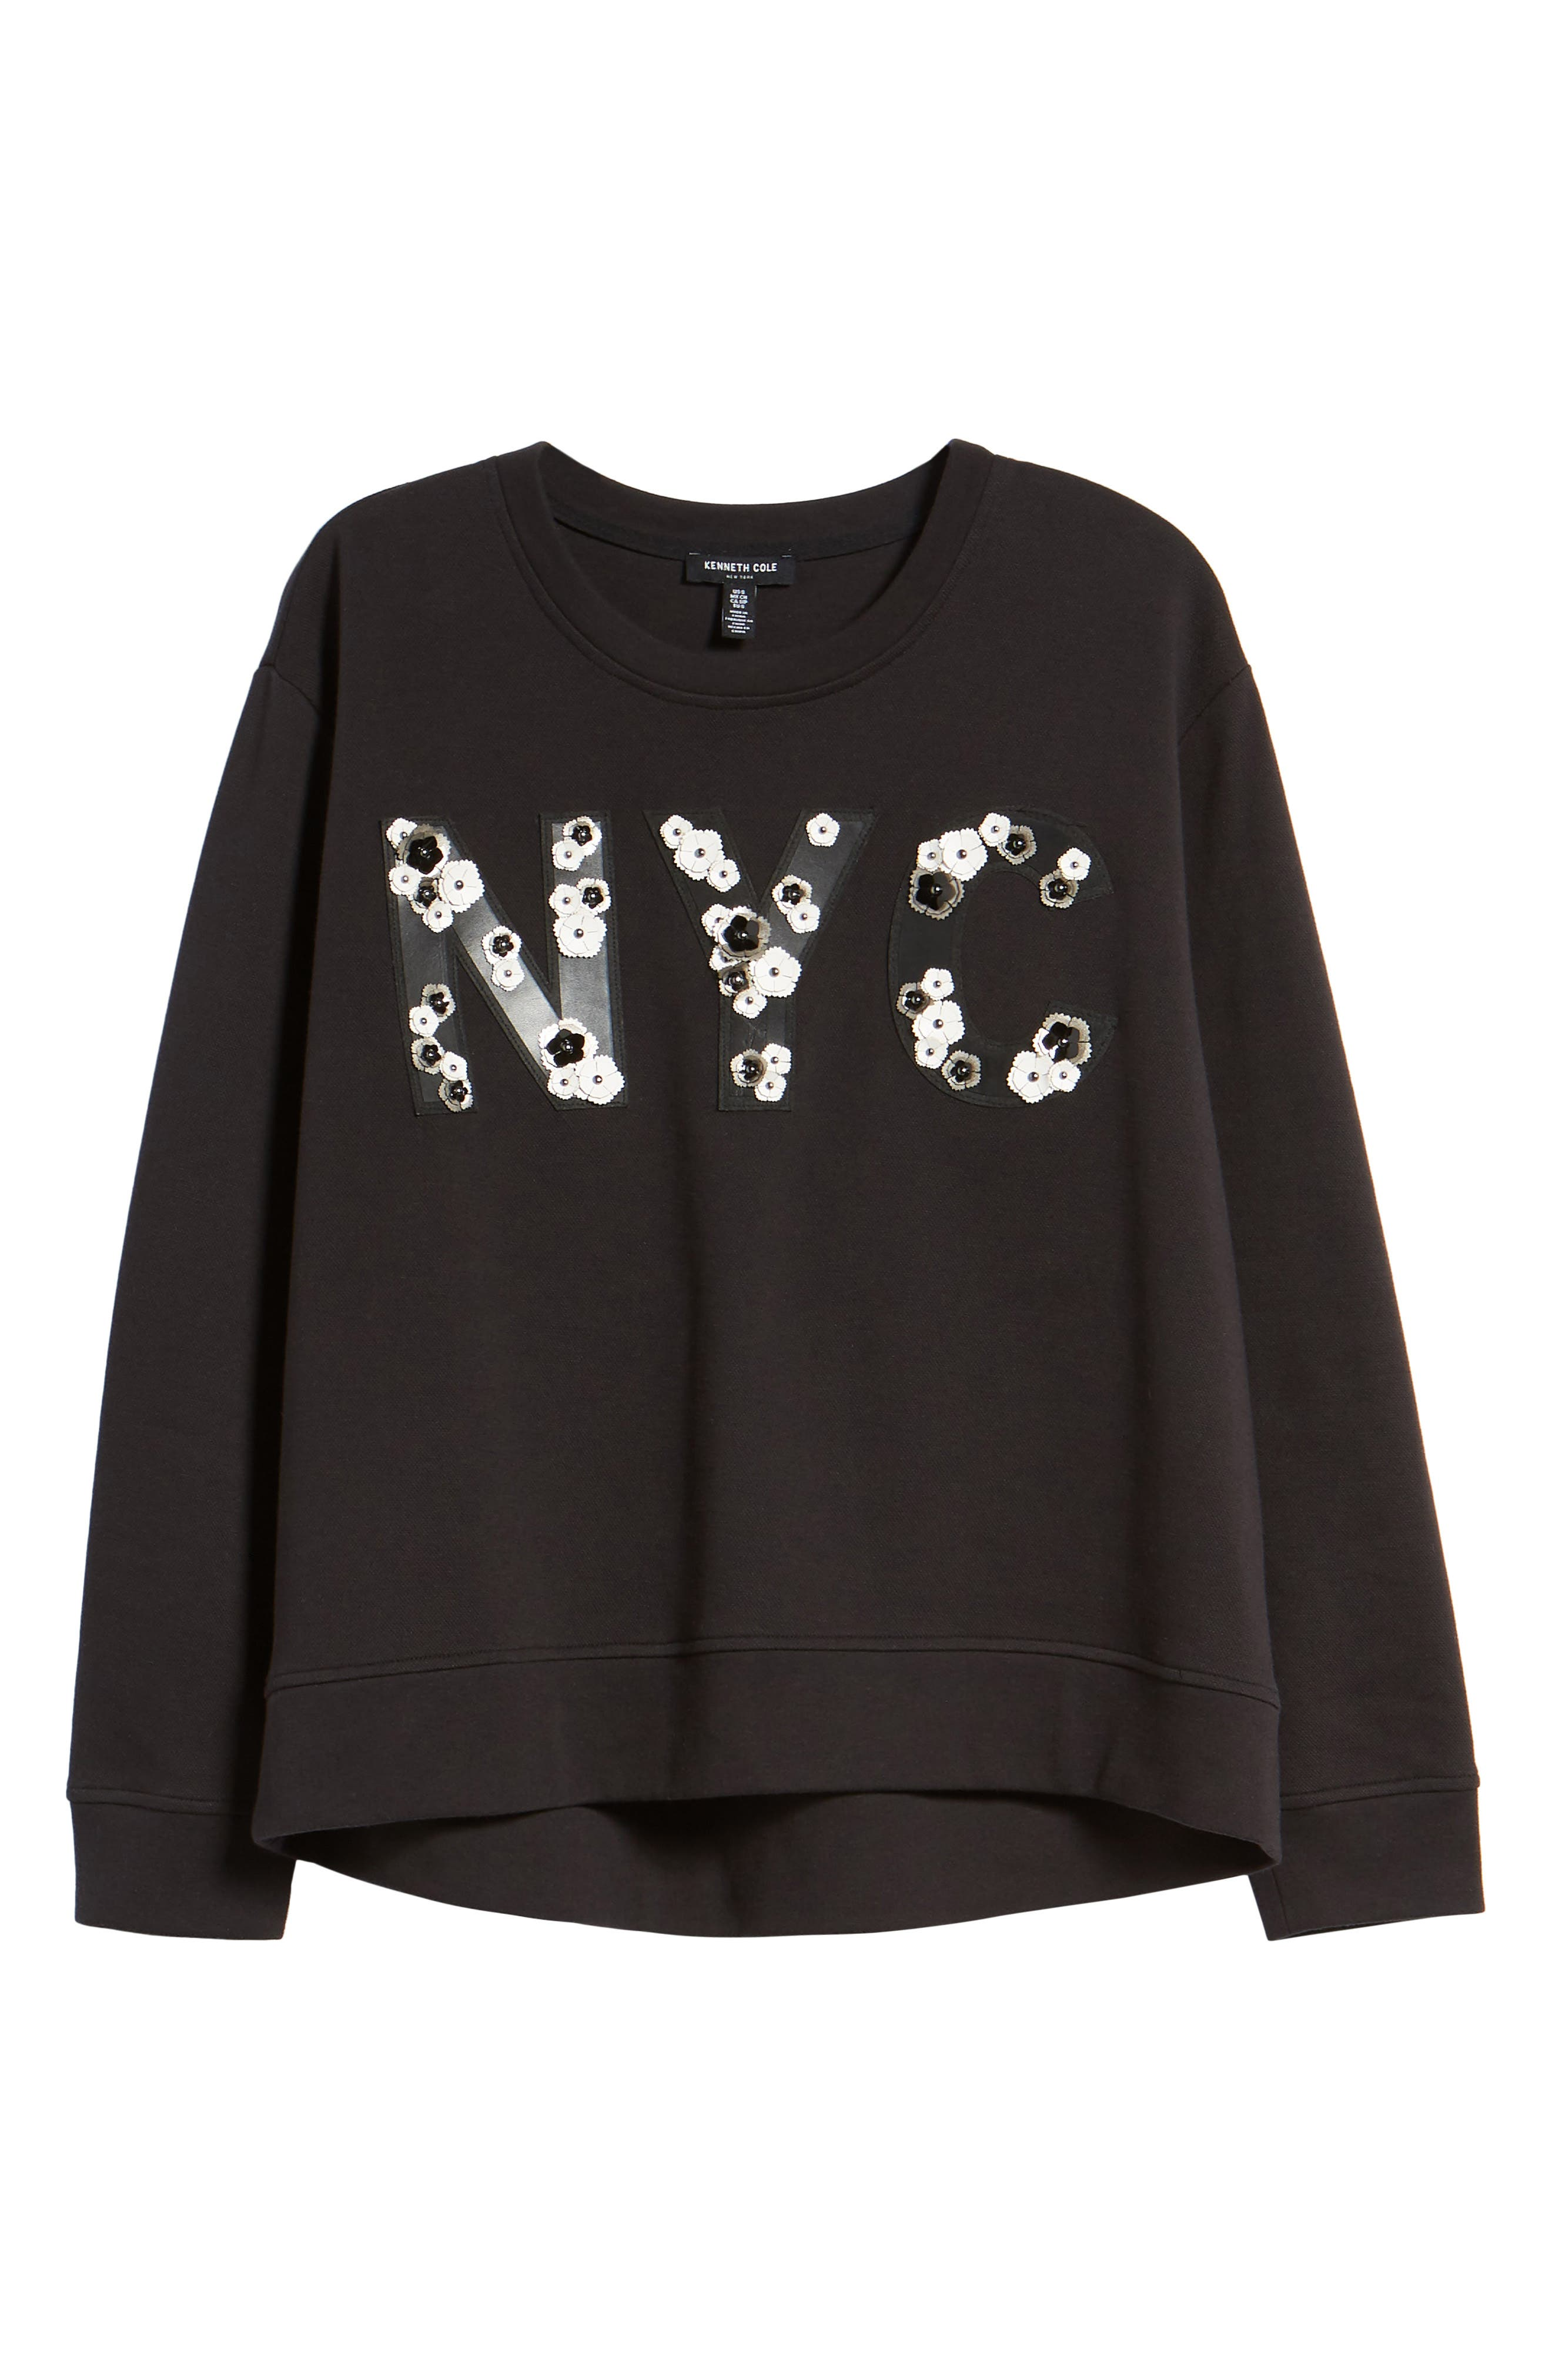 Kenneth Cole New York NYC Sweatshirt